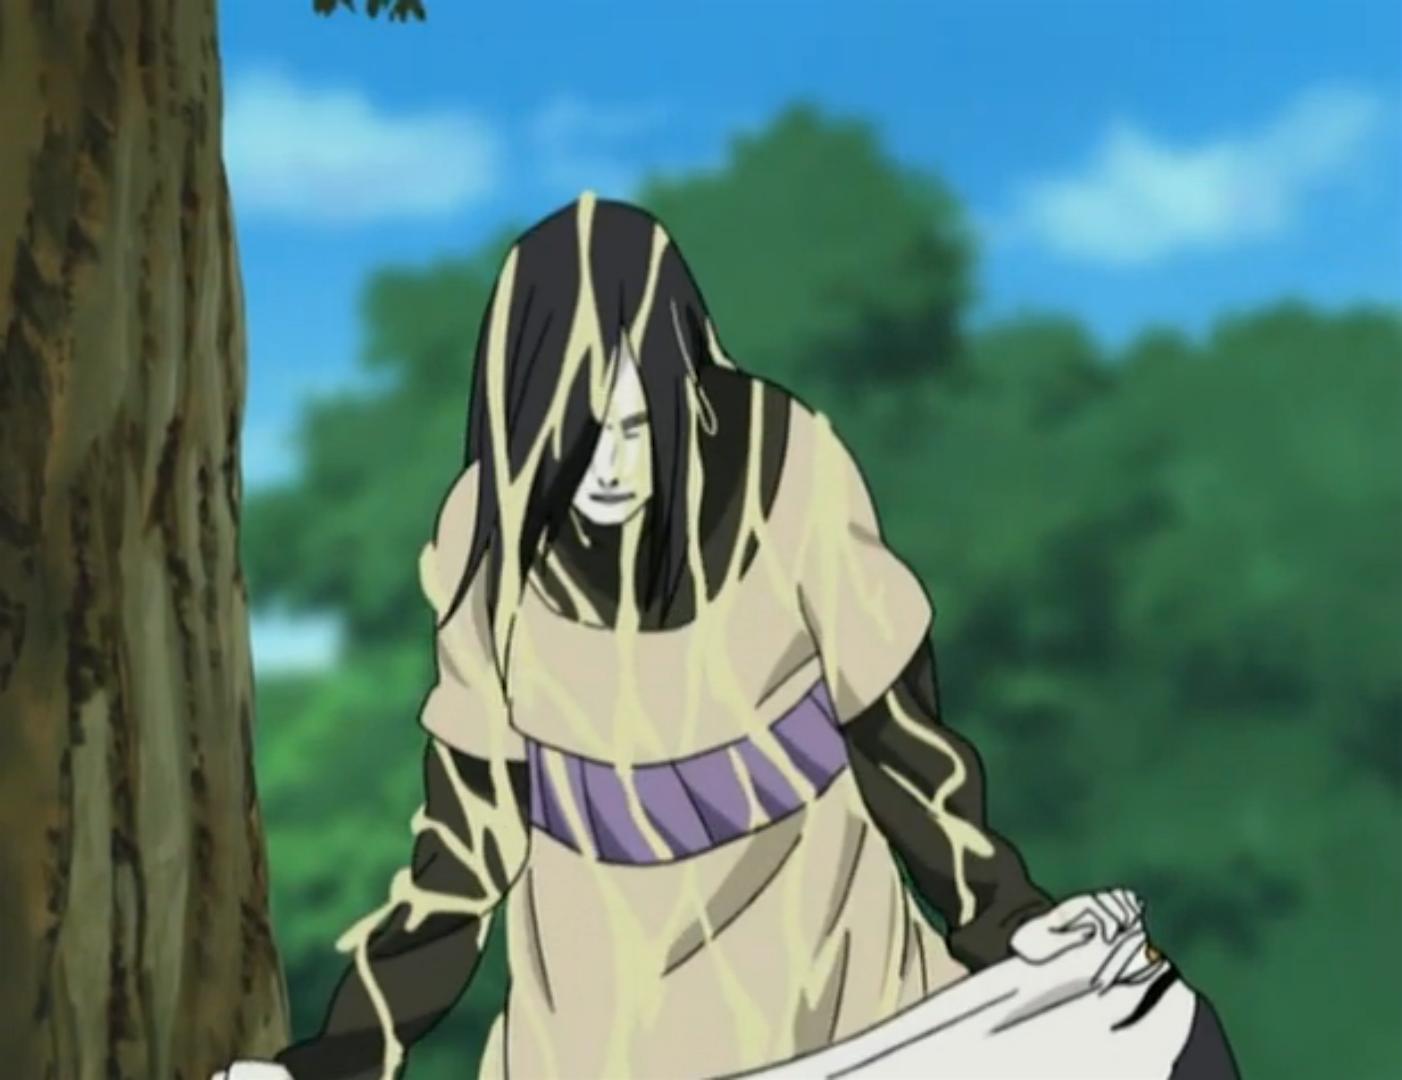 Naruto Uzumaki Vs Sasuke Uchiha Orochimaru-Style Body ...